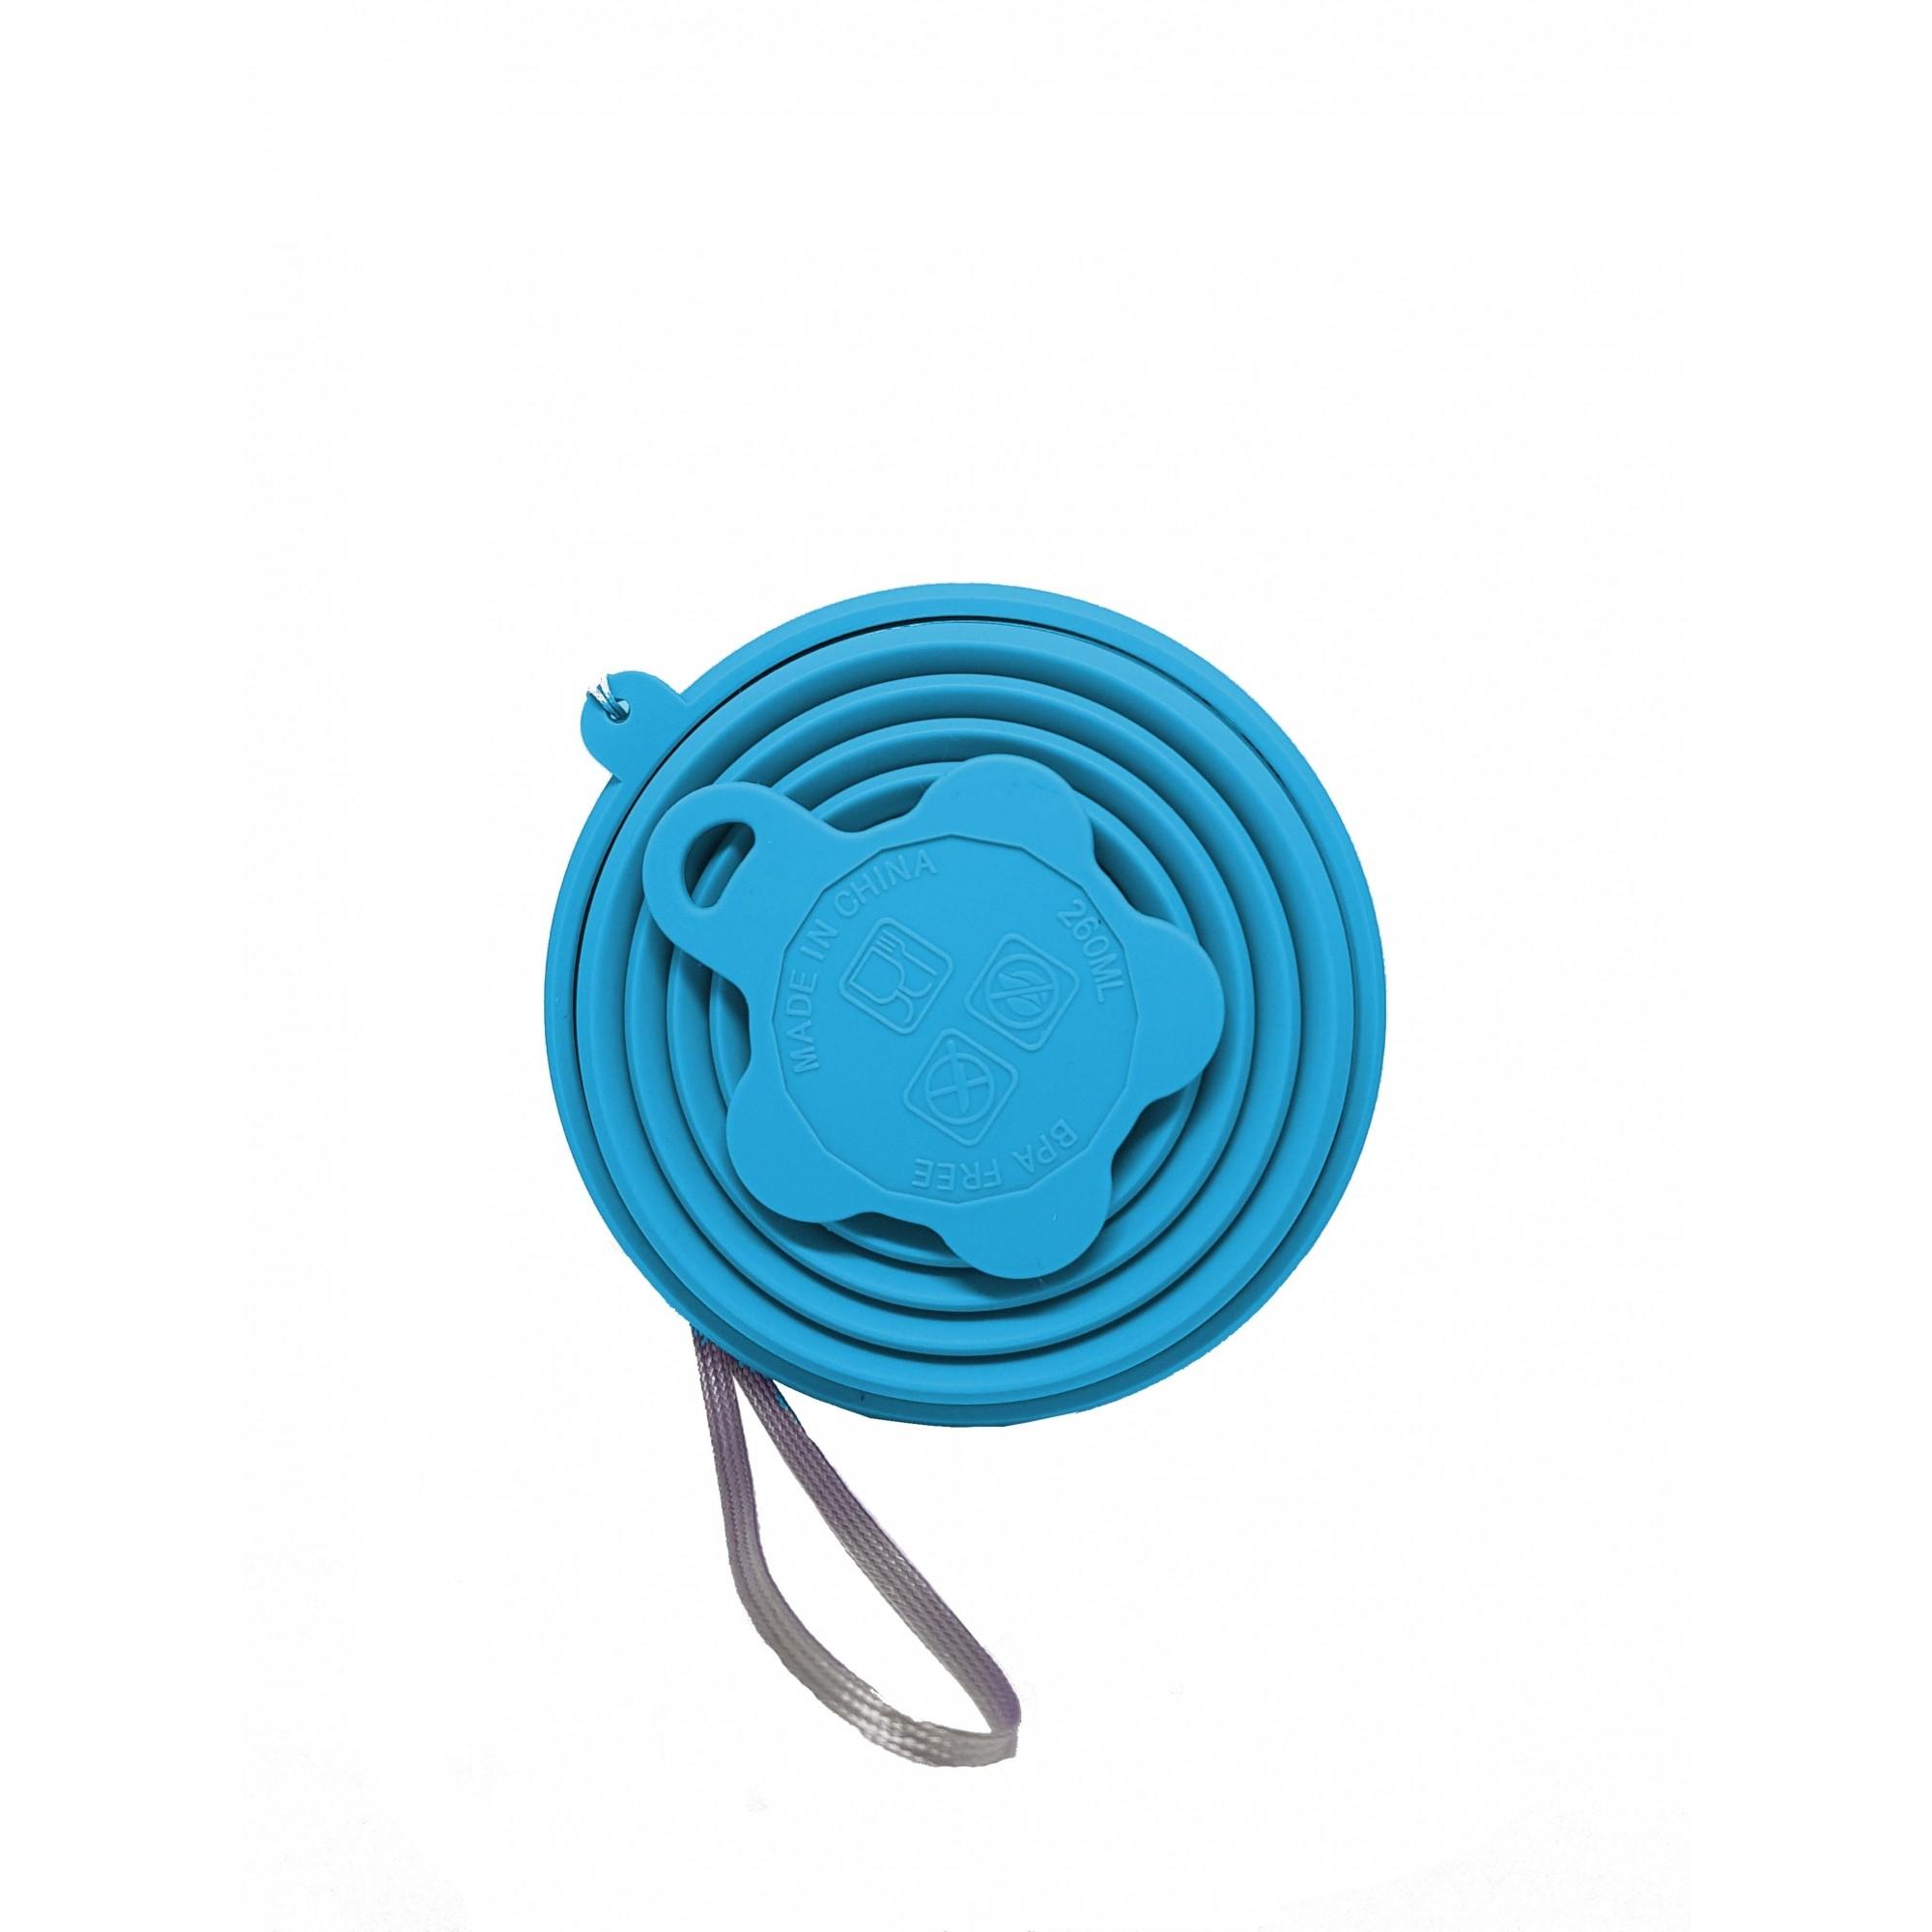 Kit Verão Inox Azul